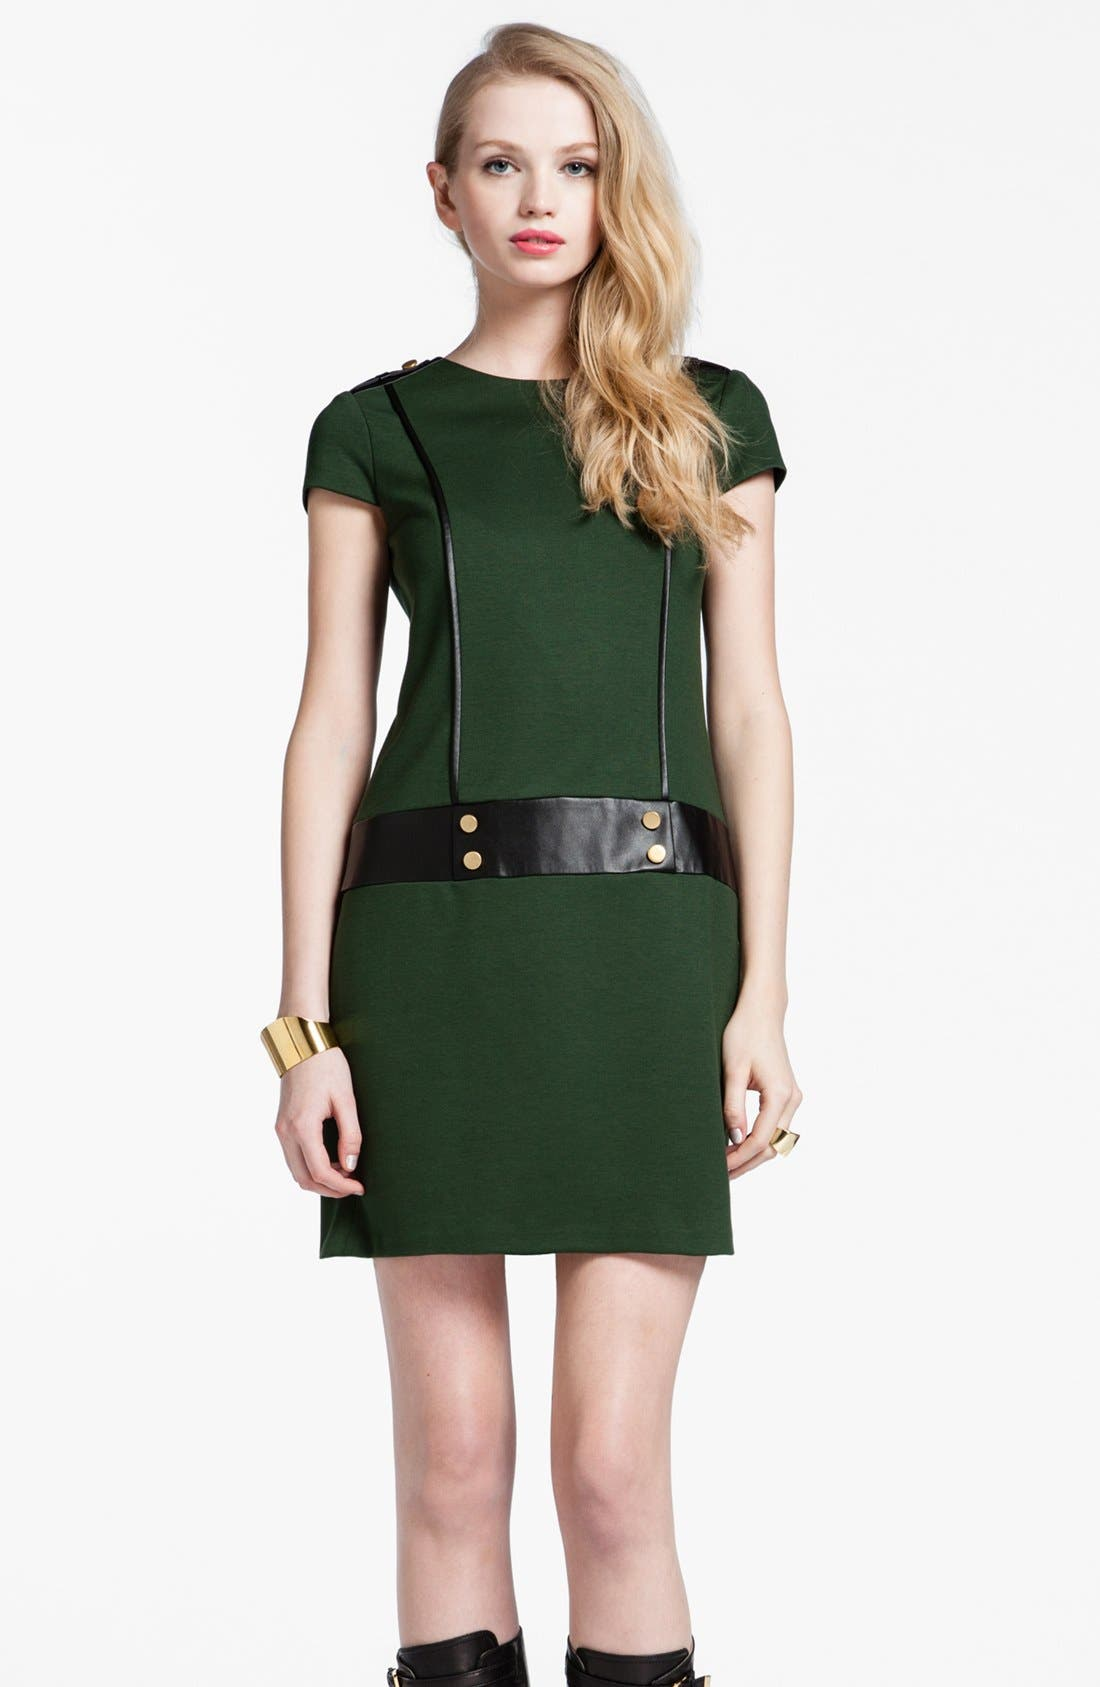 Alternate Image 1 Selected - Cynthia Steffe 'Perla' Faux Leather Trim Shift Dress